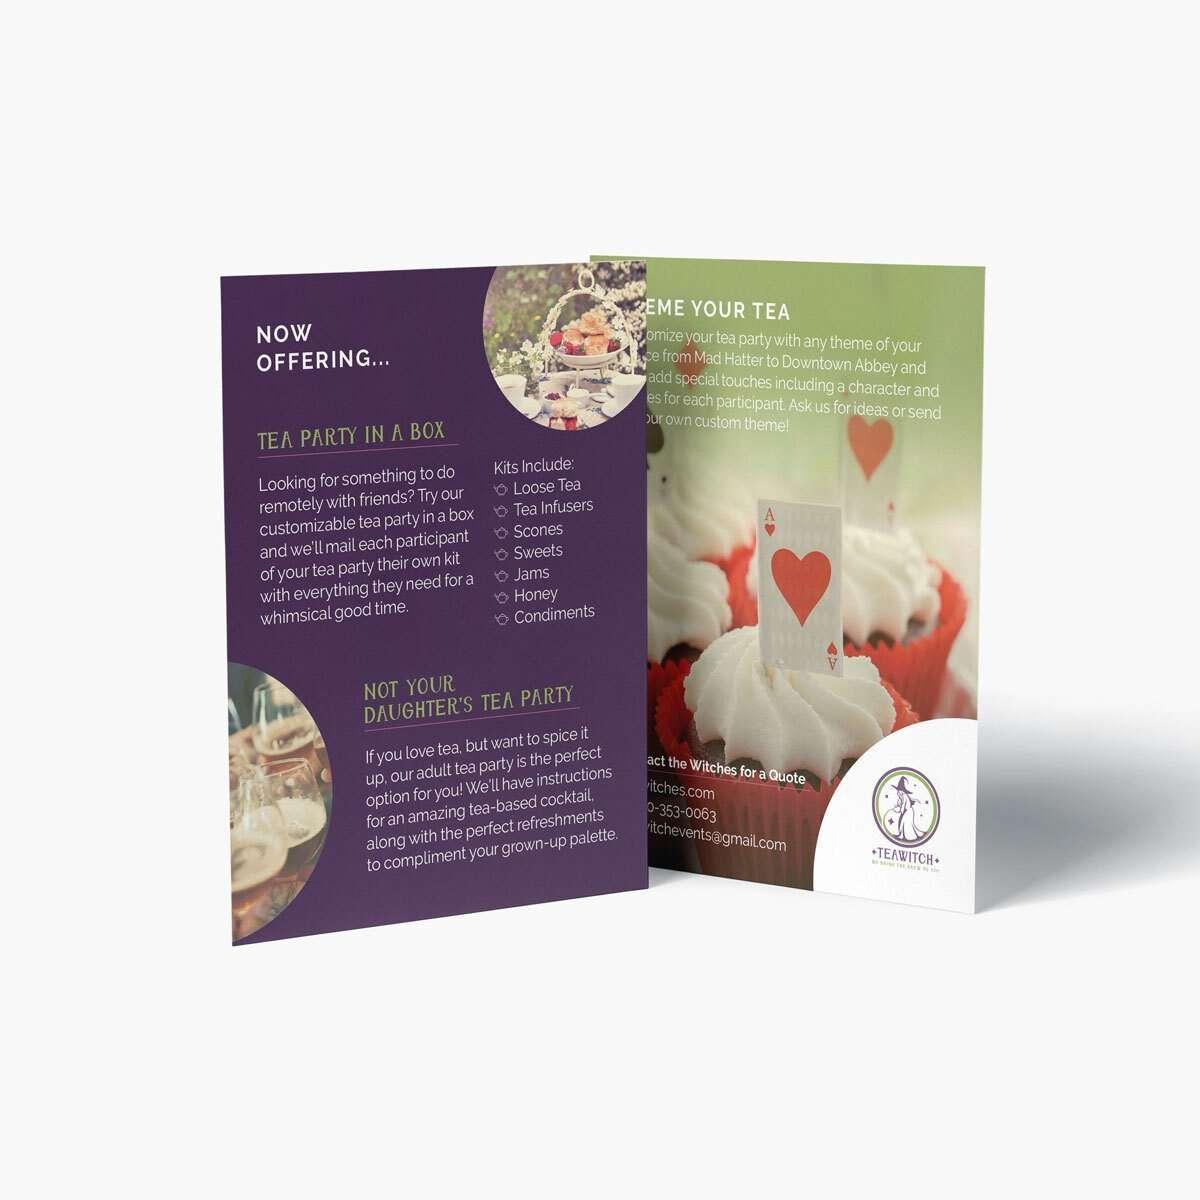 Tea party catering brochure design from BrandSwan, a Delaware branding agency